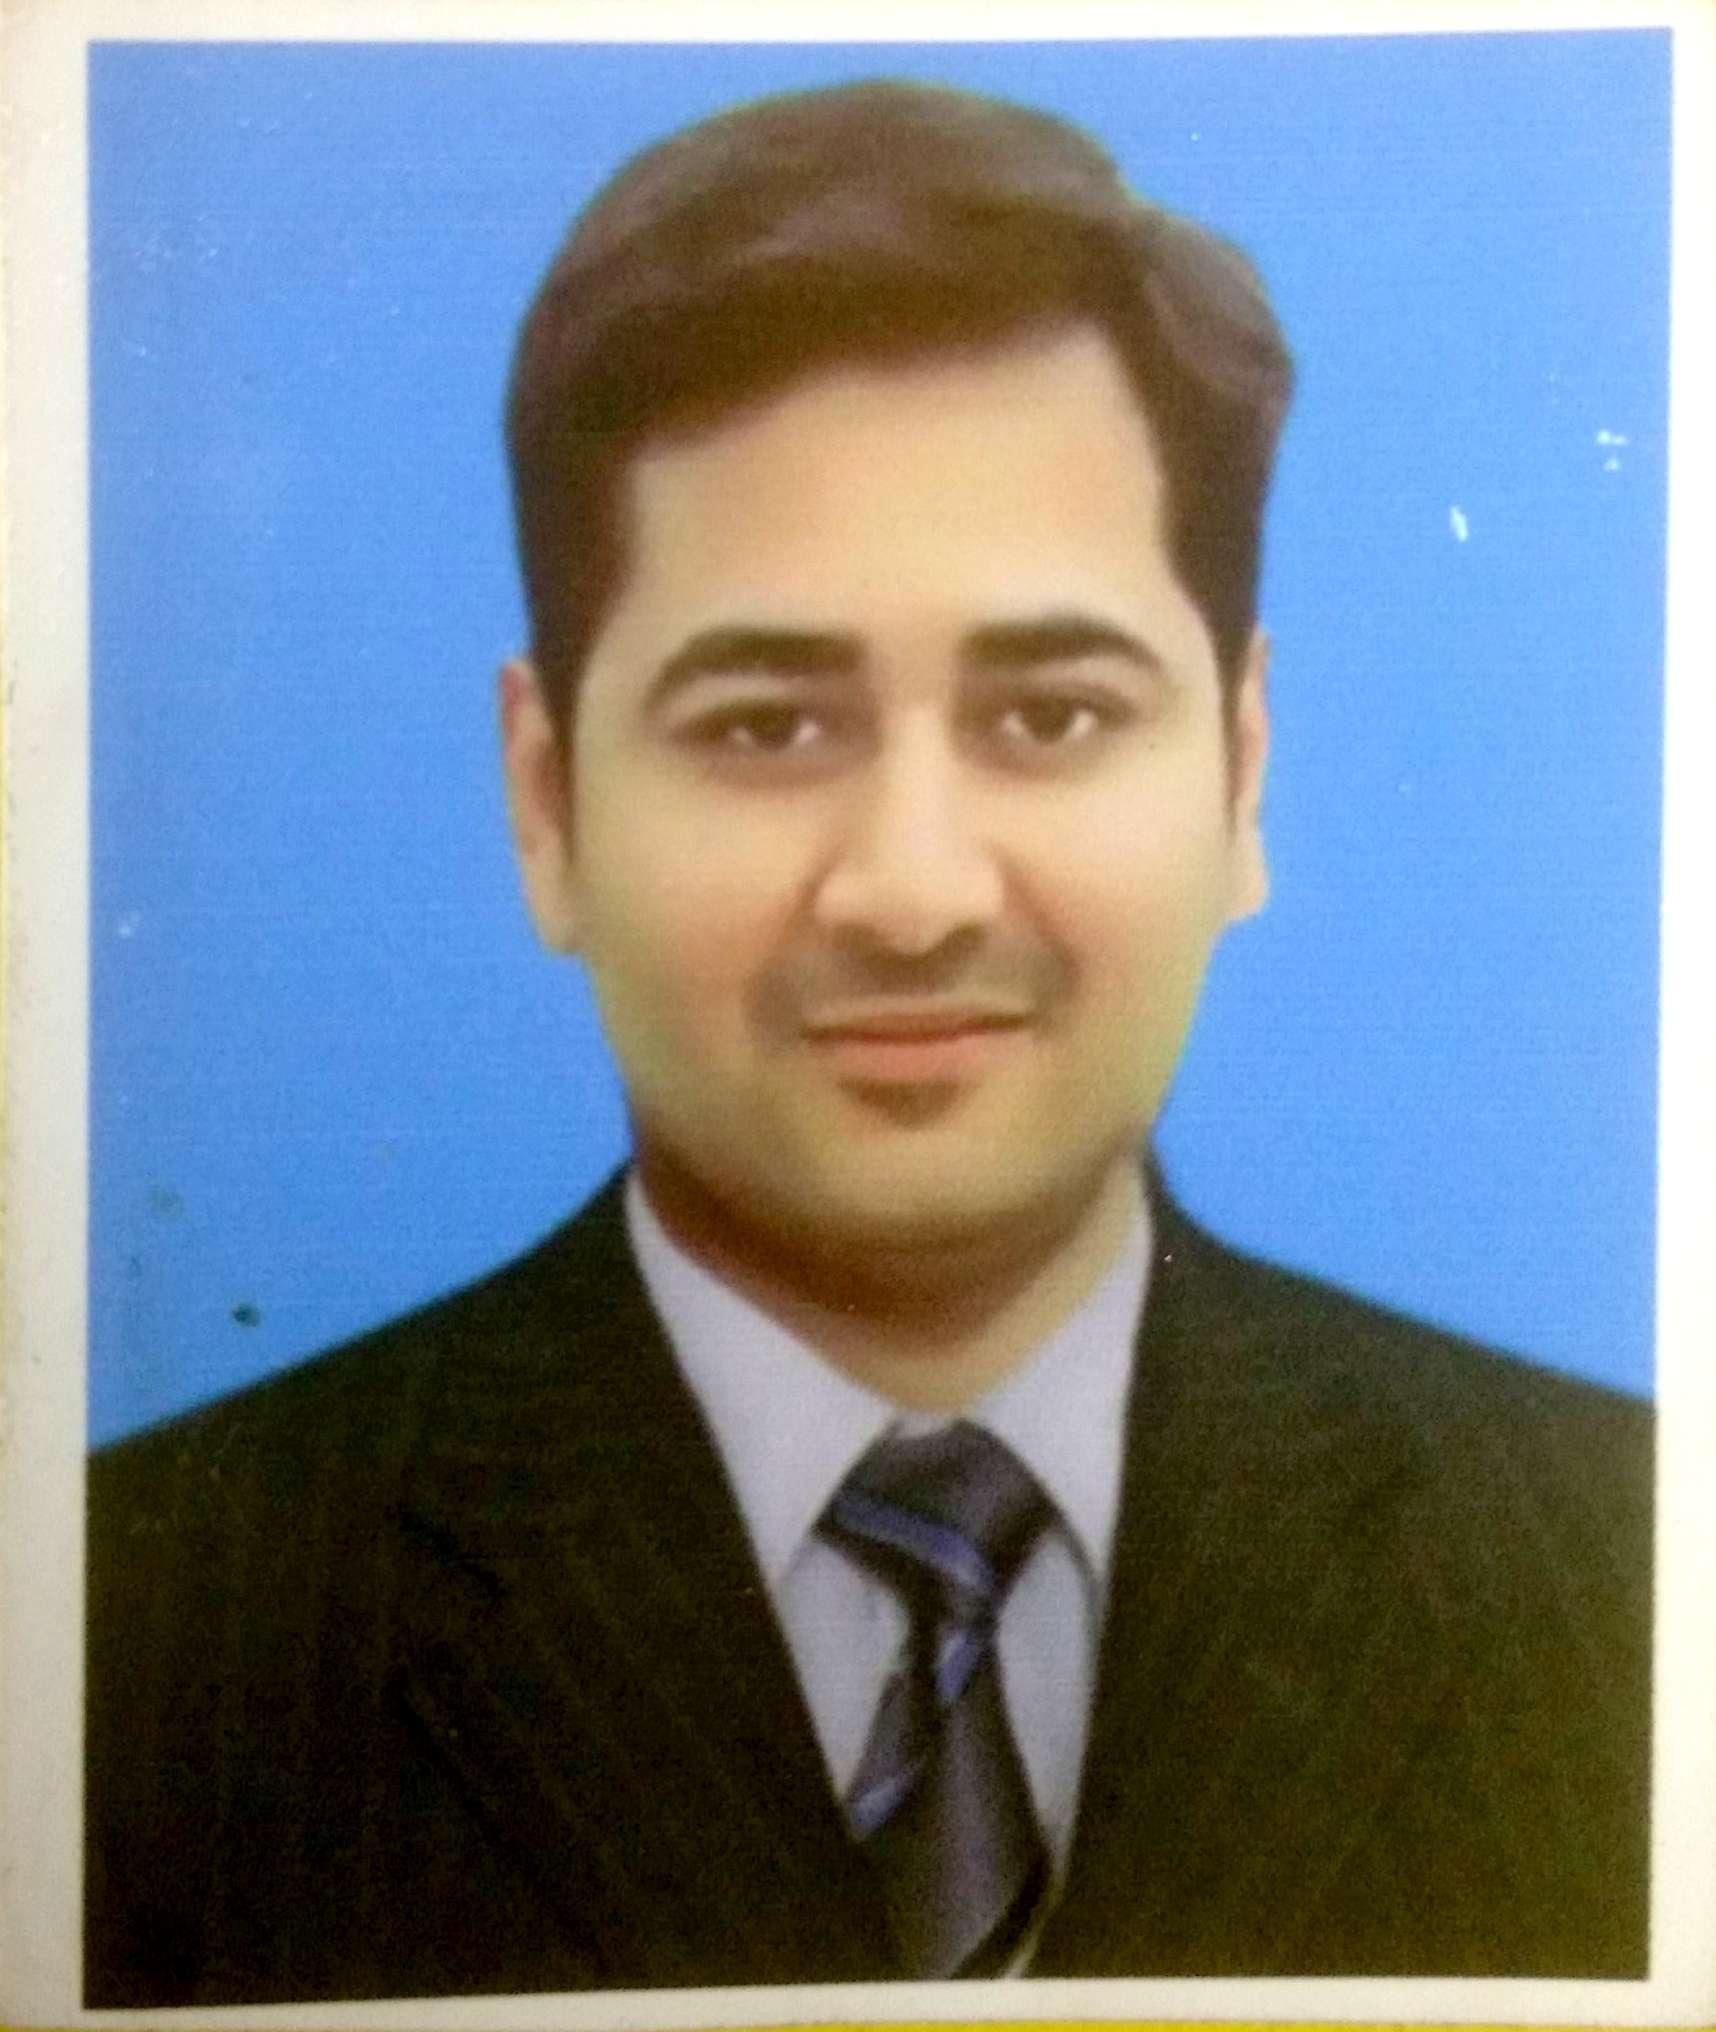 Shahrooz Malik Computer Security, Twitter, Python